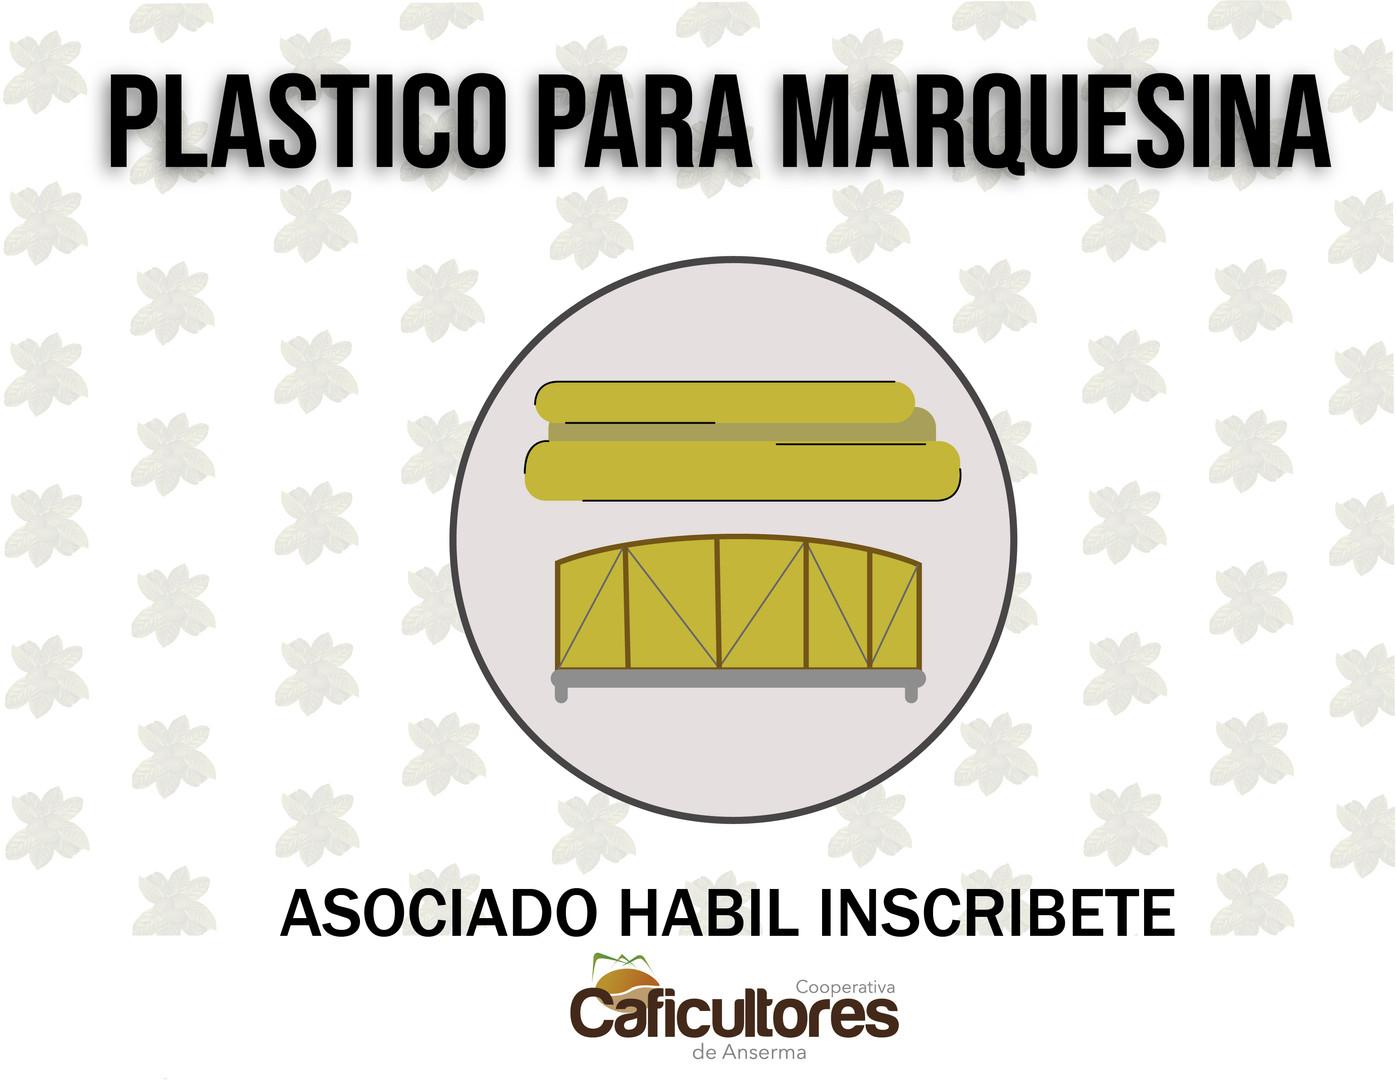 plastico para marquesina.jpg